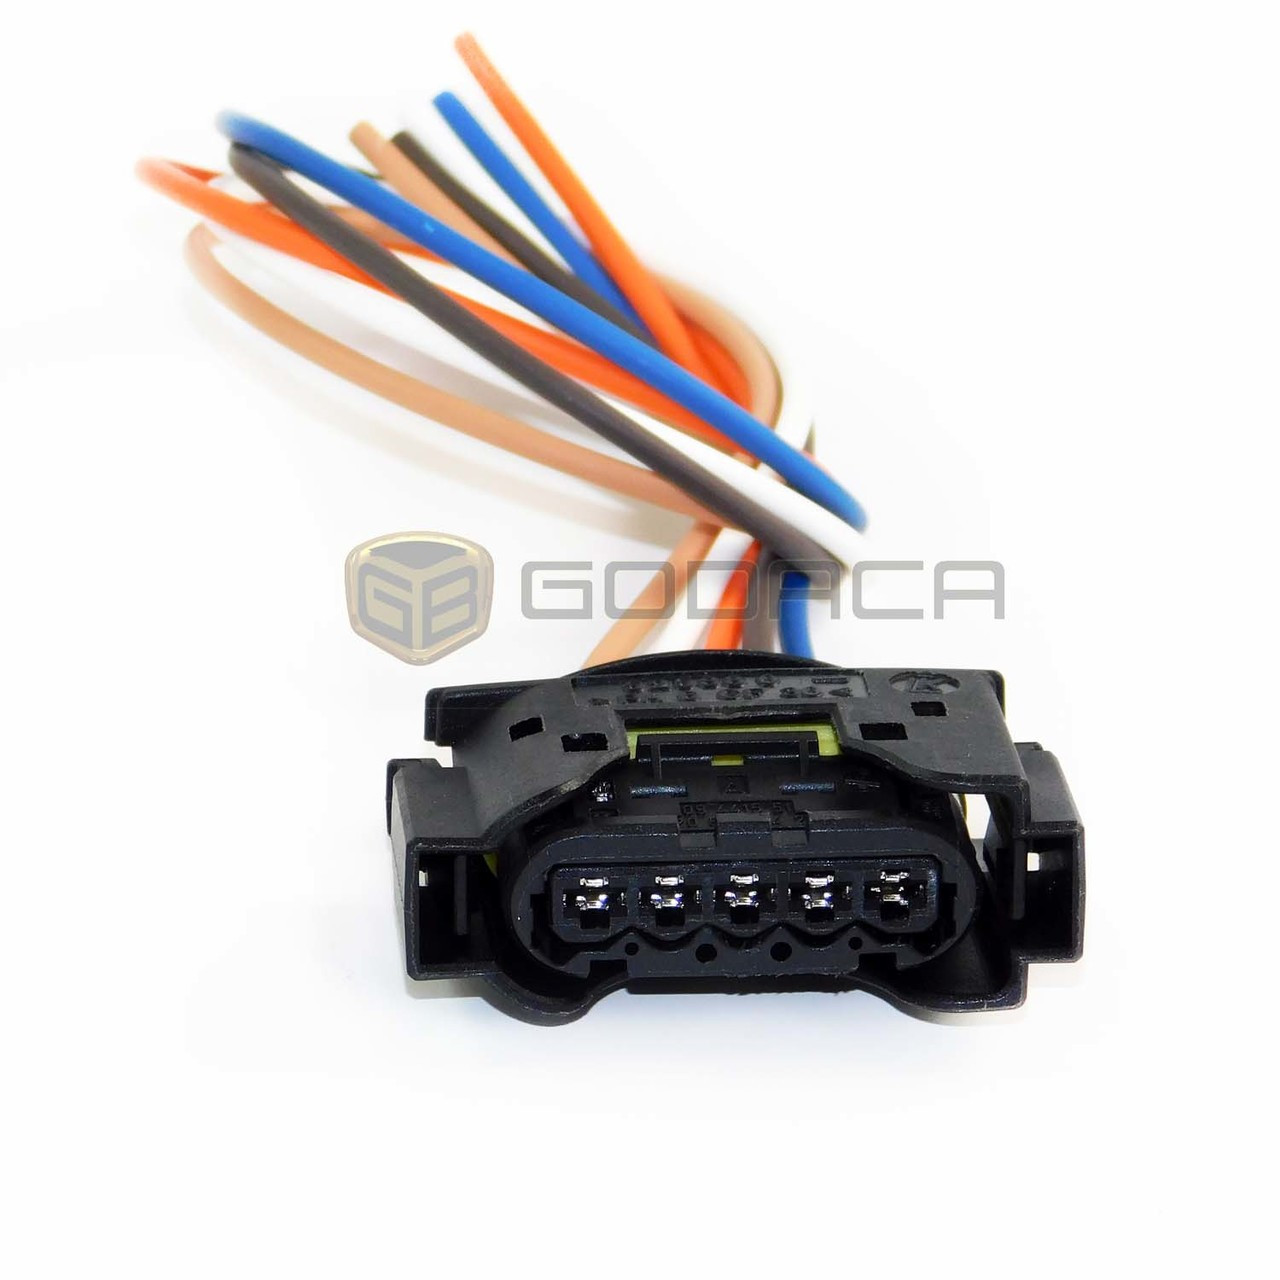 medium resolution of 1x connector 5 way 5 pin for mercedes benz preheater a 2205450429 godaca llc